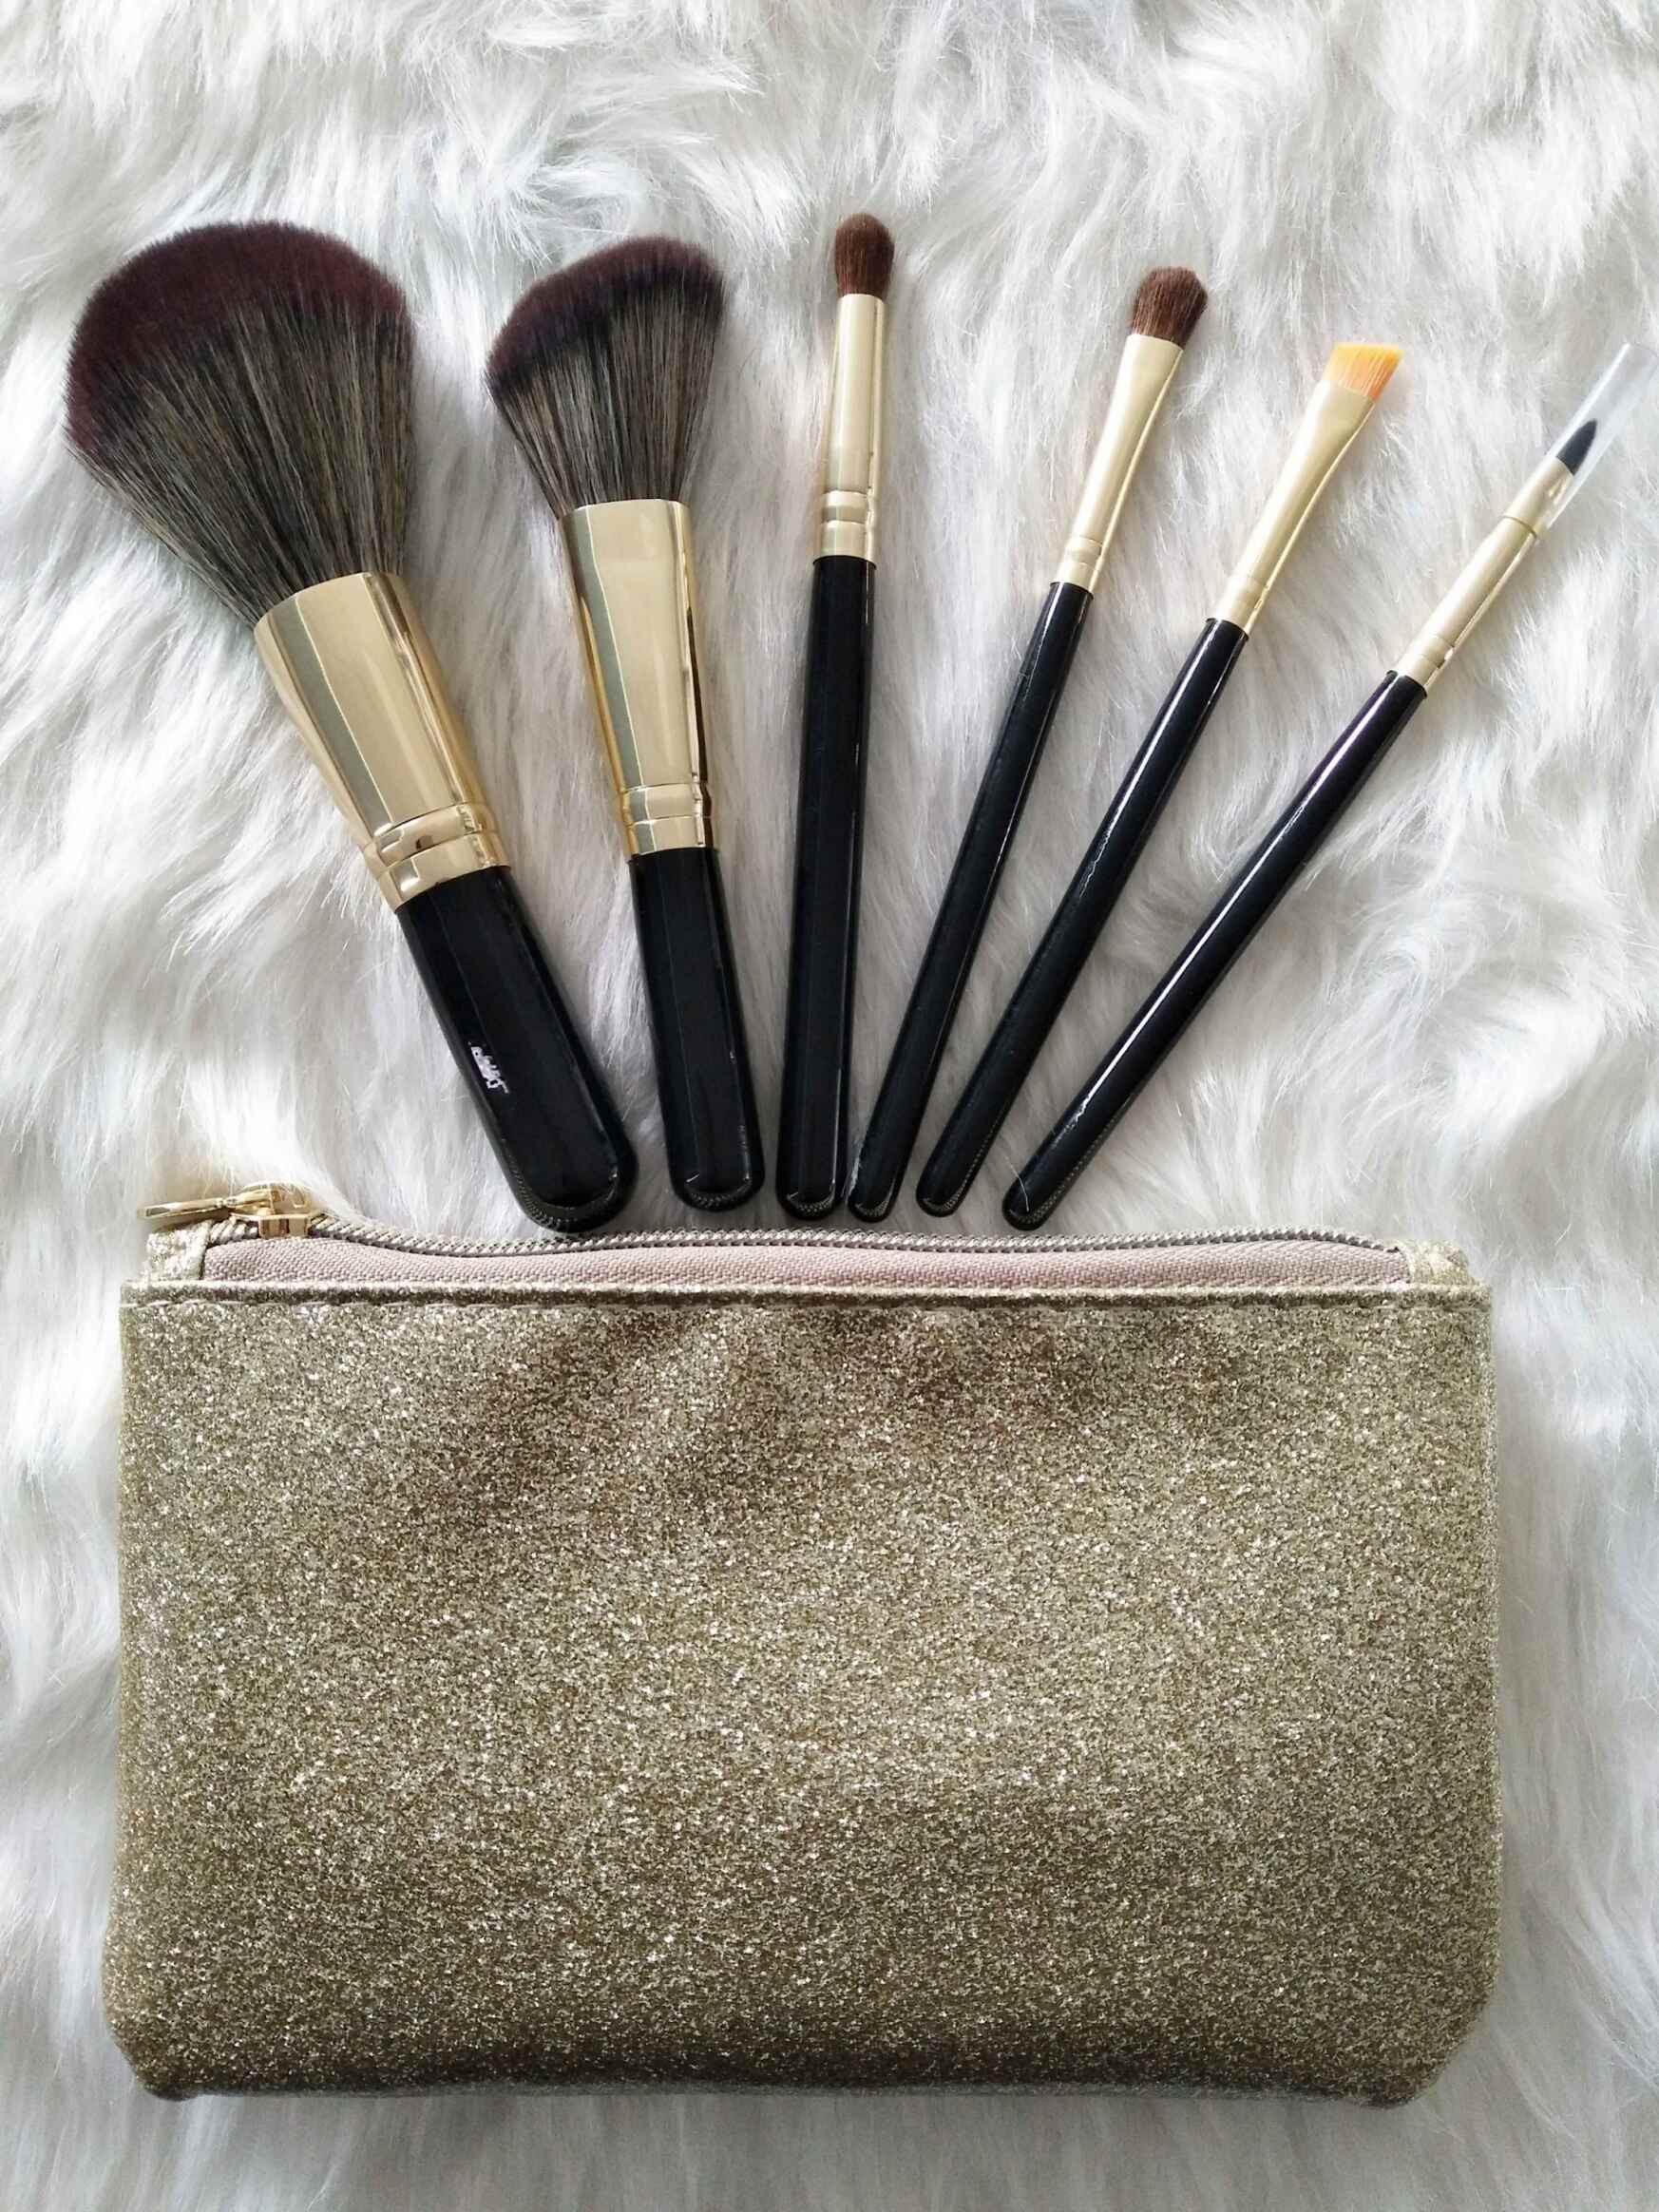 2019 Professional Cosmetic Makeup Animal Imitation Hair Large Size Face Contour Brush